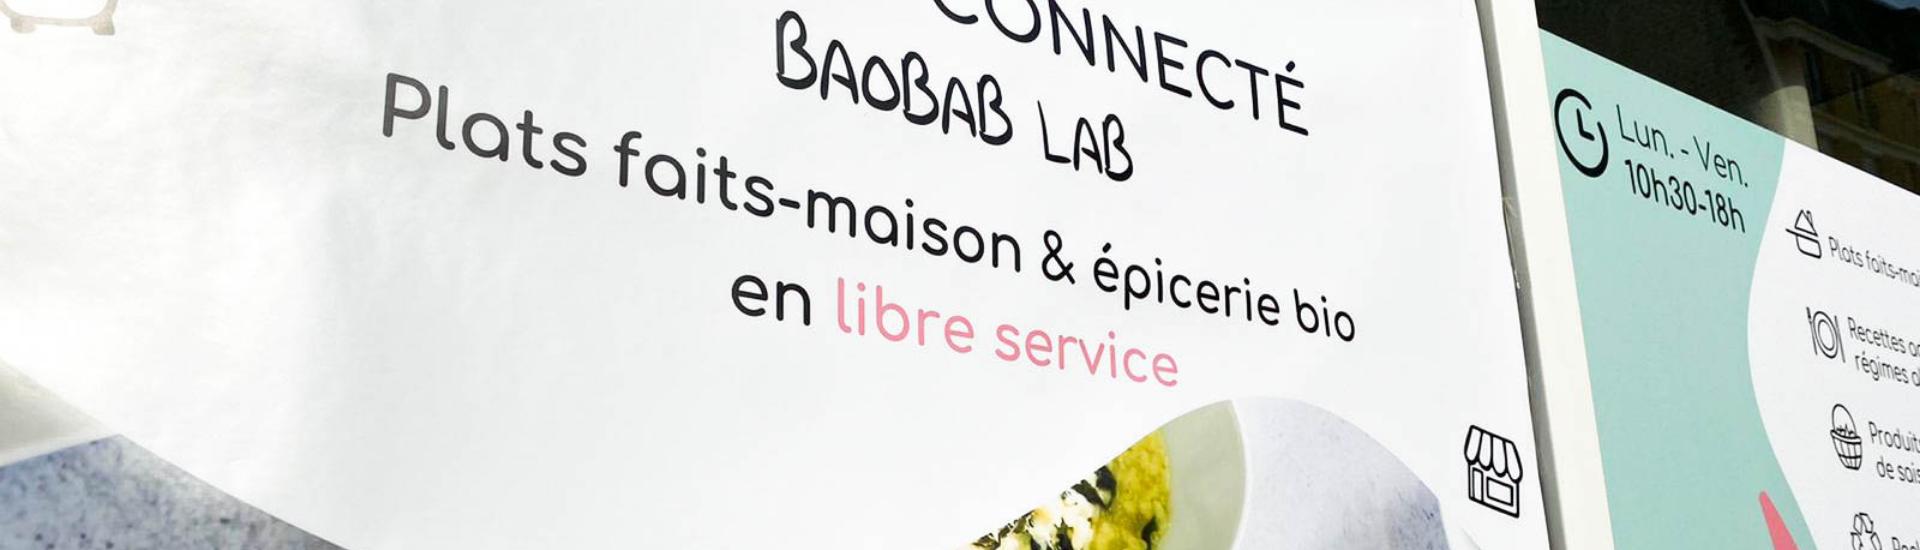 Visuel_blog_BaobabLab